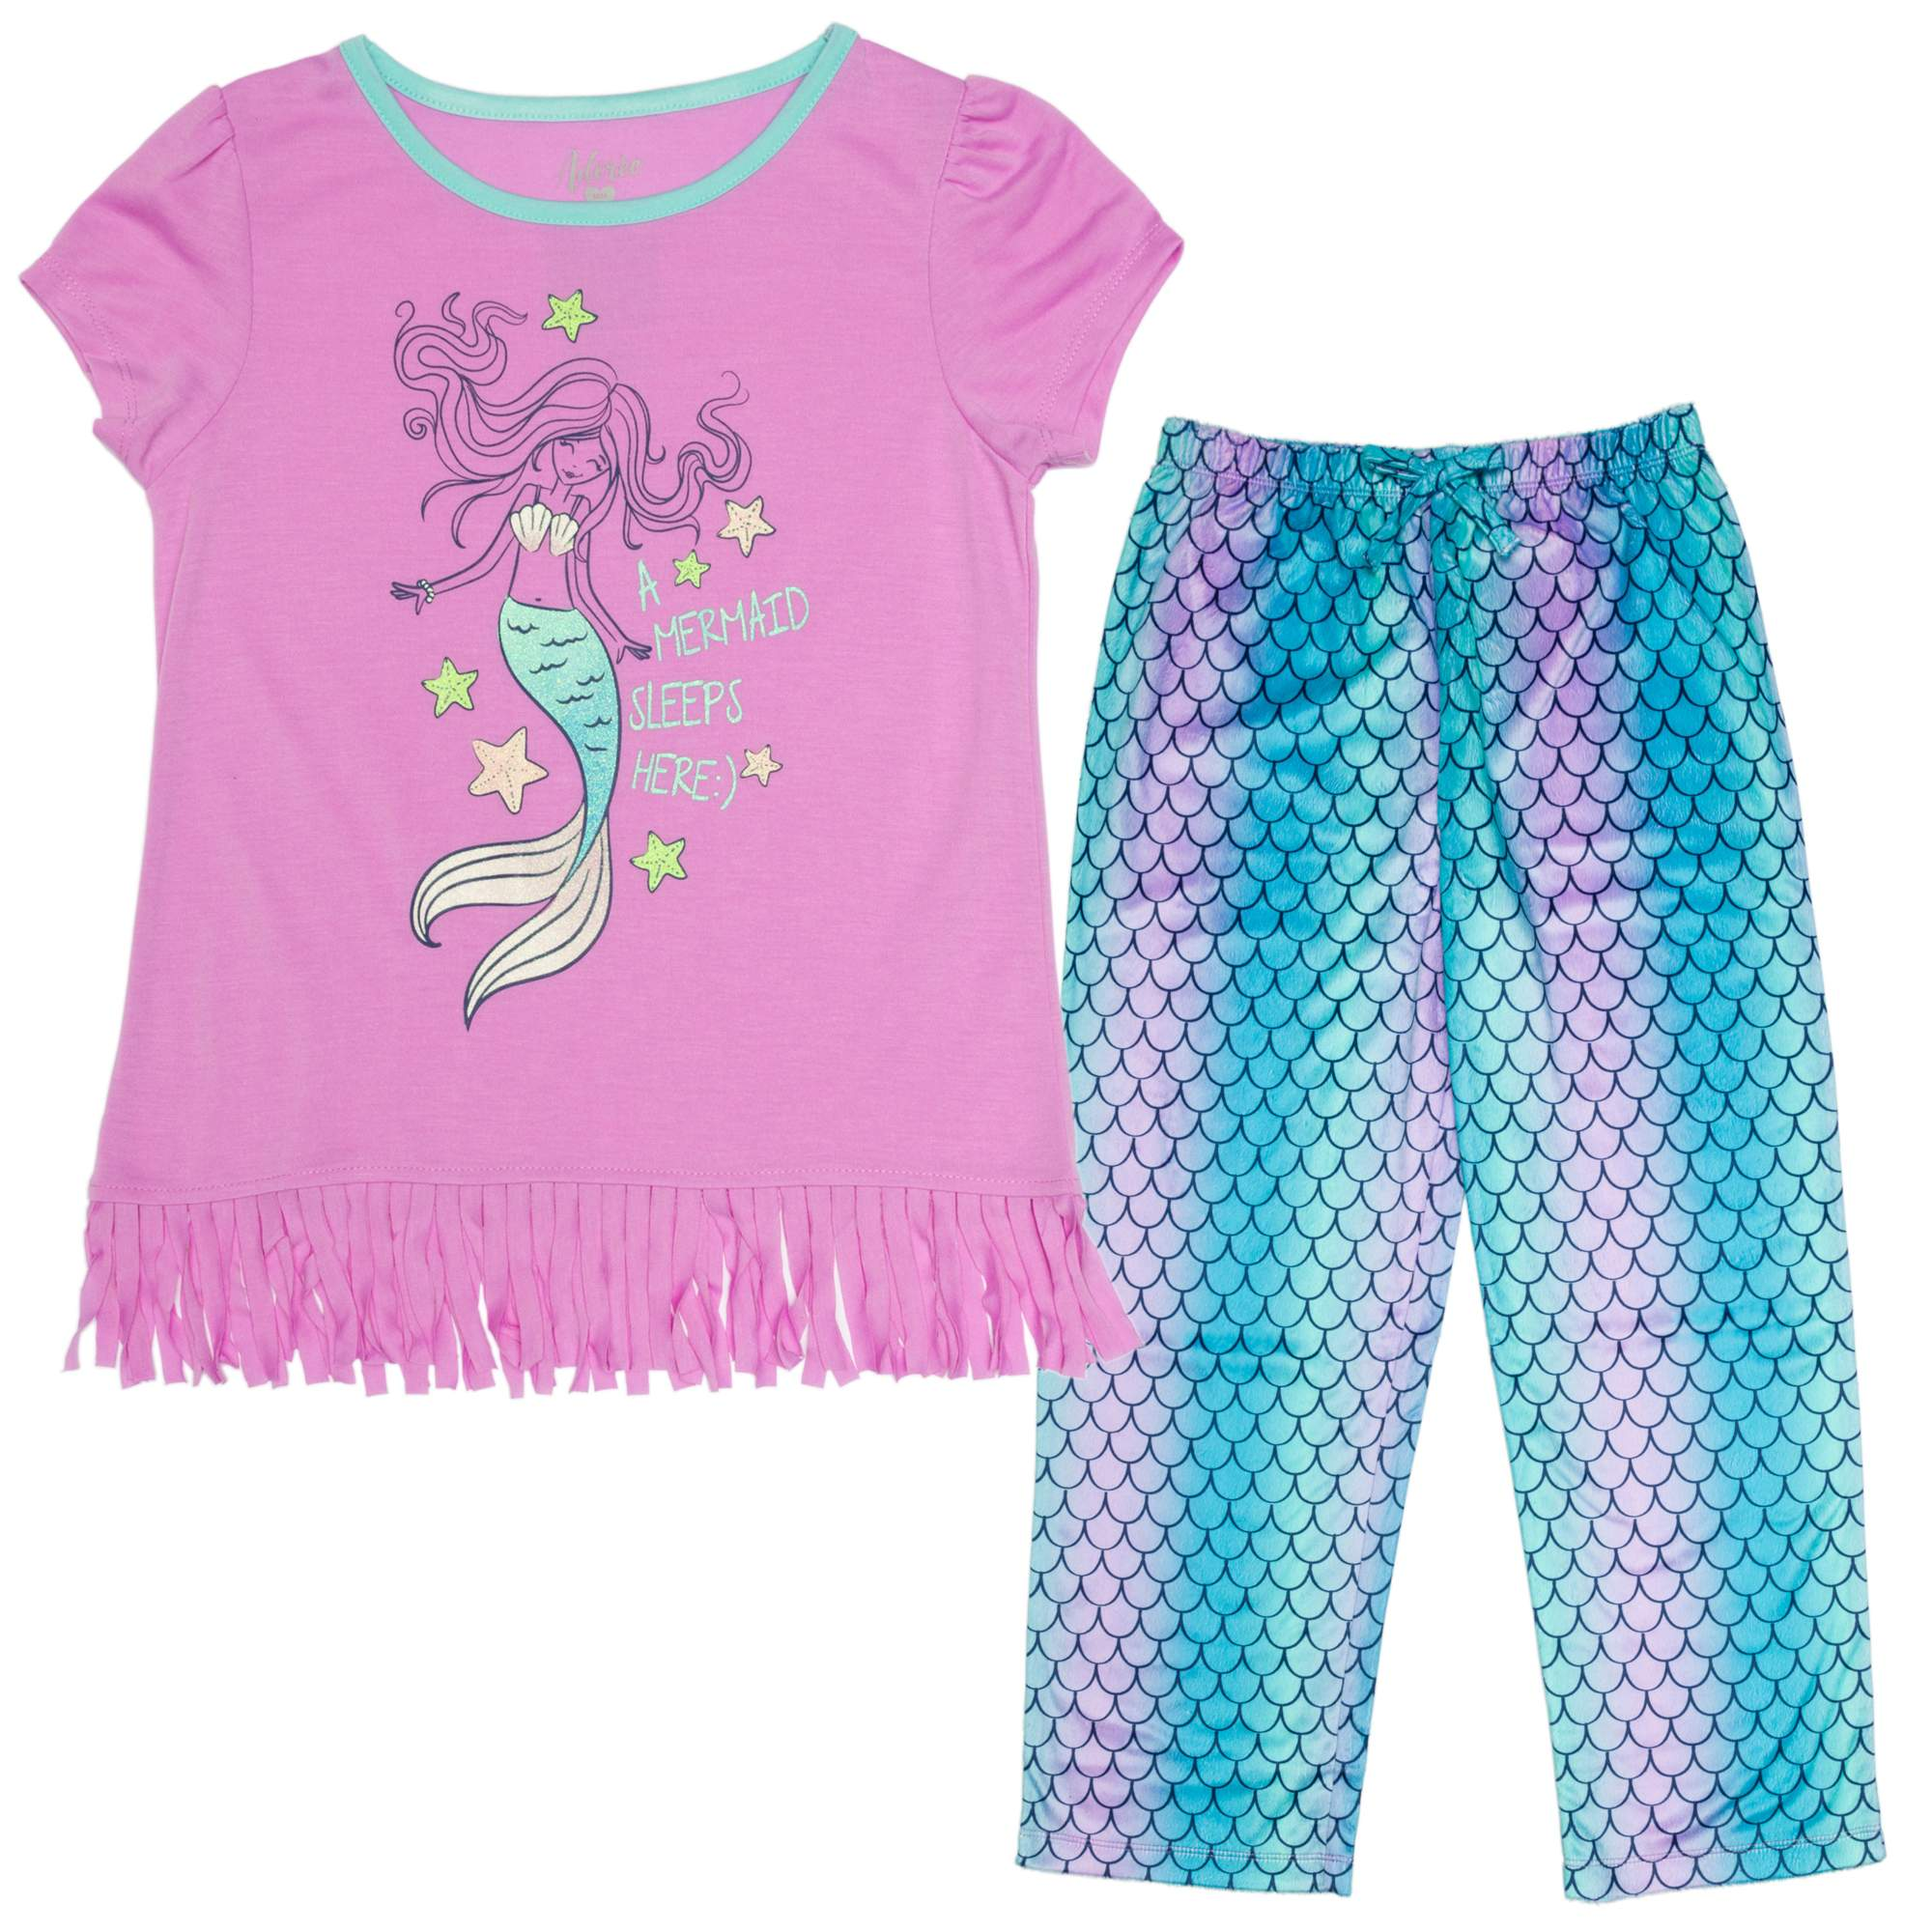 Image of Girl's Mermaid 2 Piece Sleep Pant Set with Fringe Graphic Tee